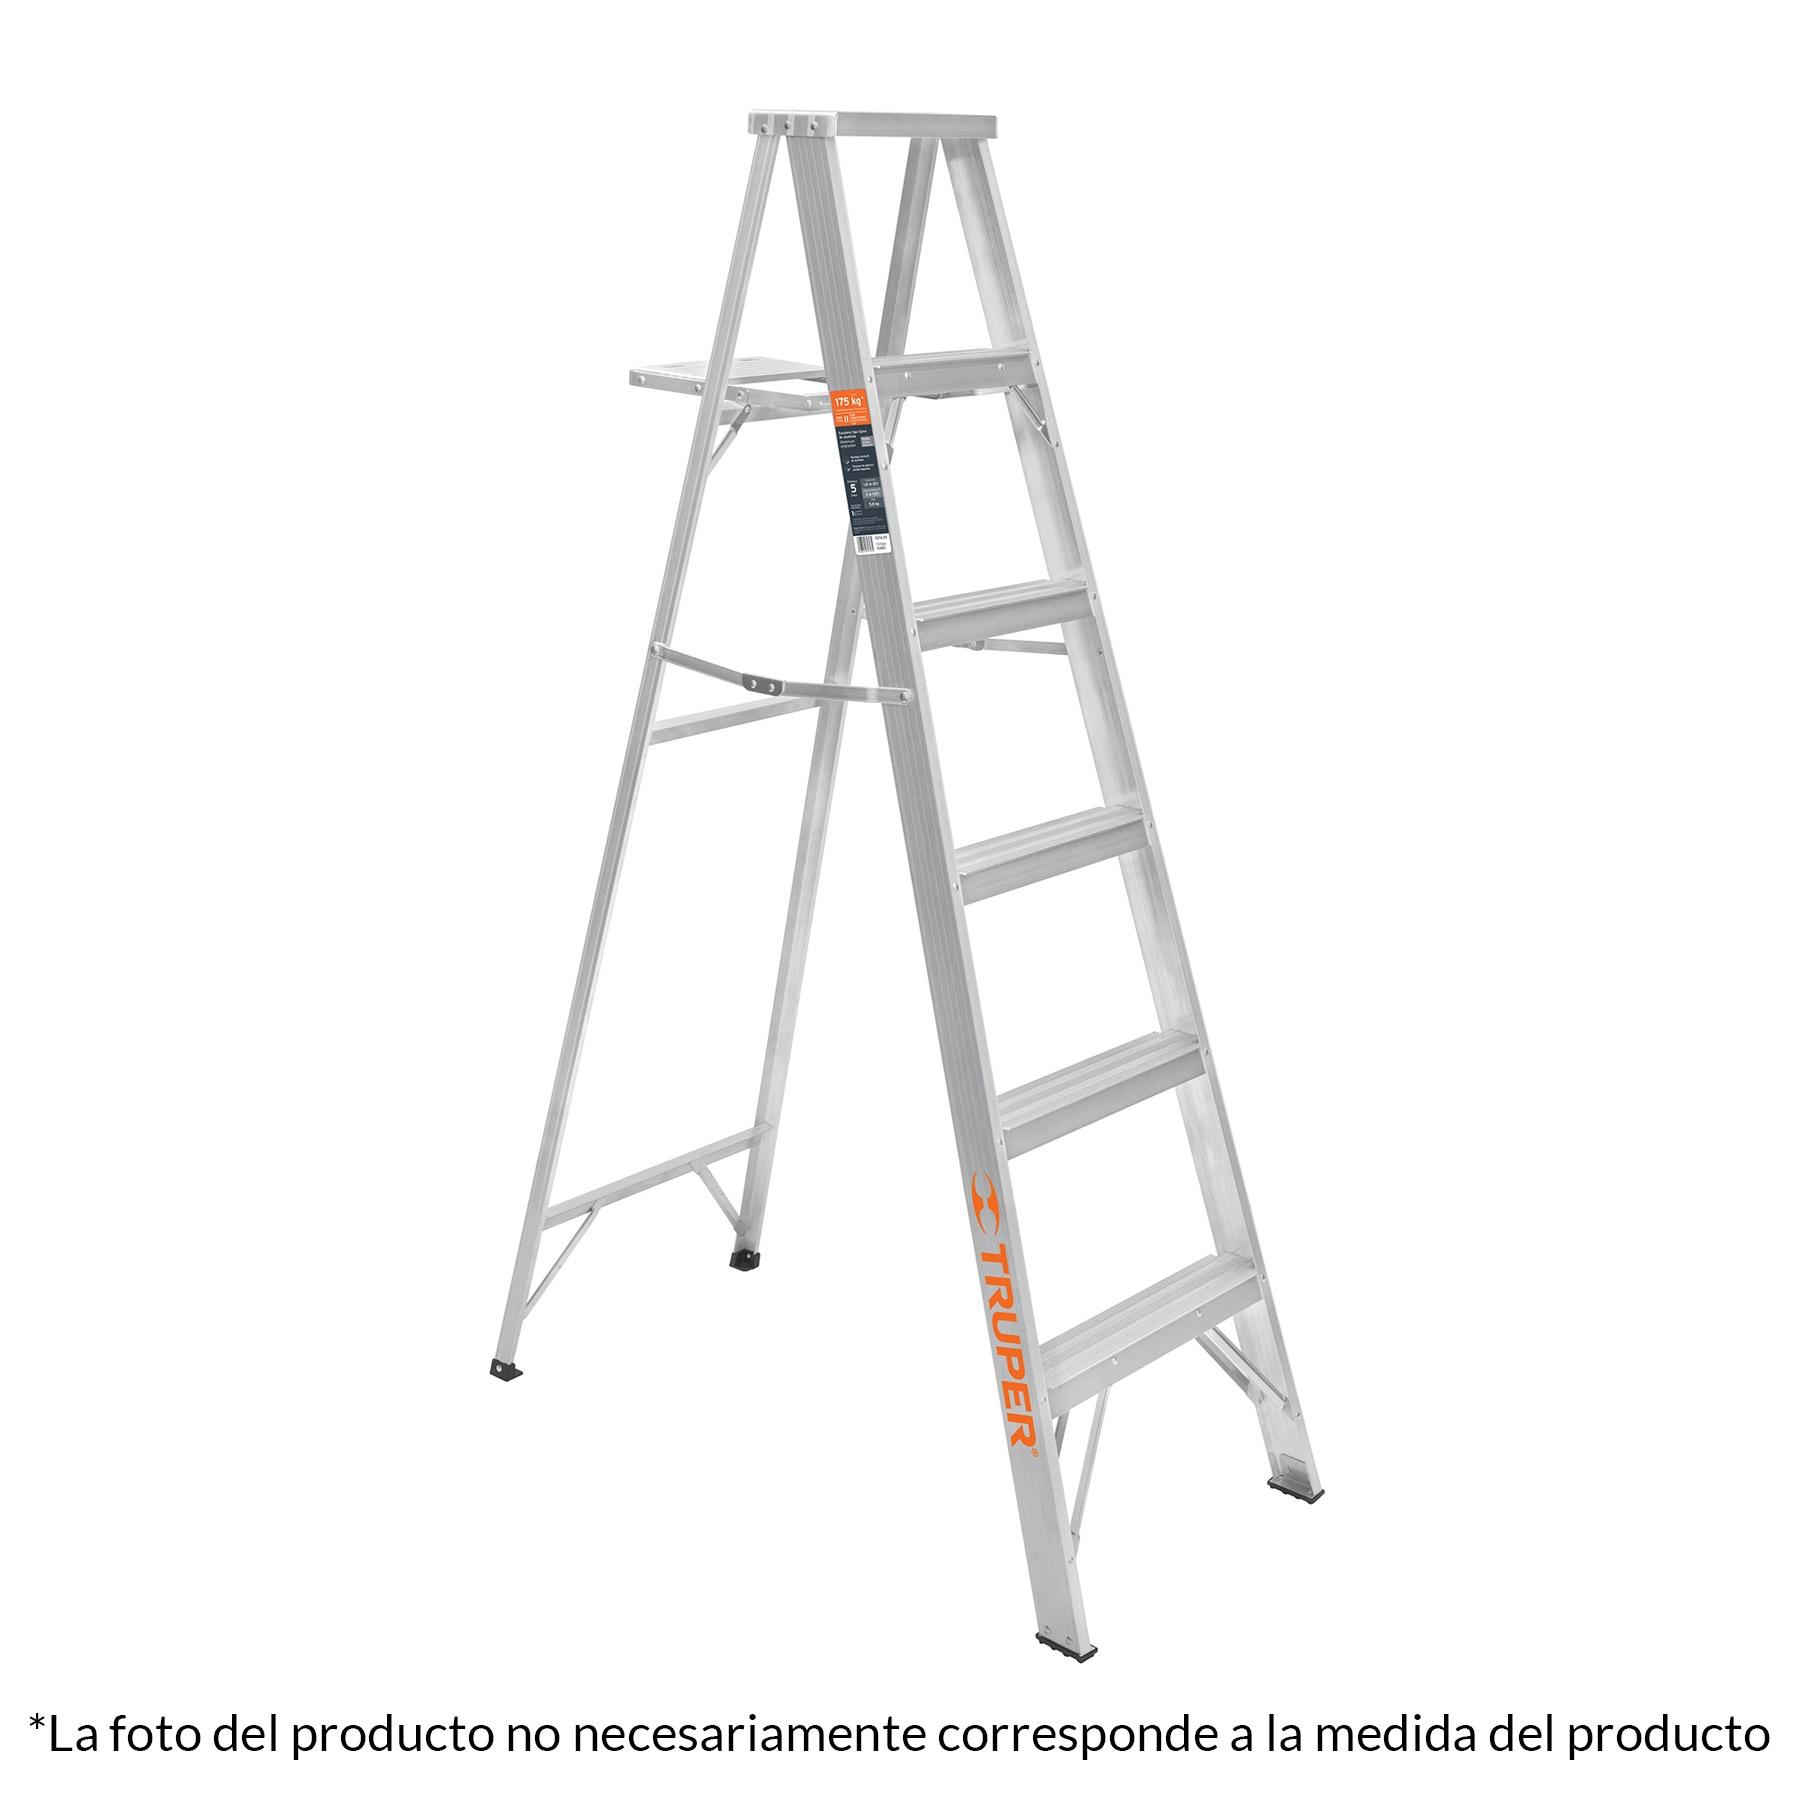 Escalera de tijera, aluminio, tipo ll, 5 escalones